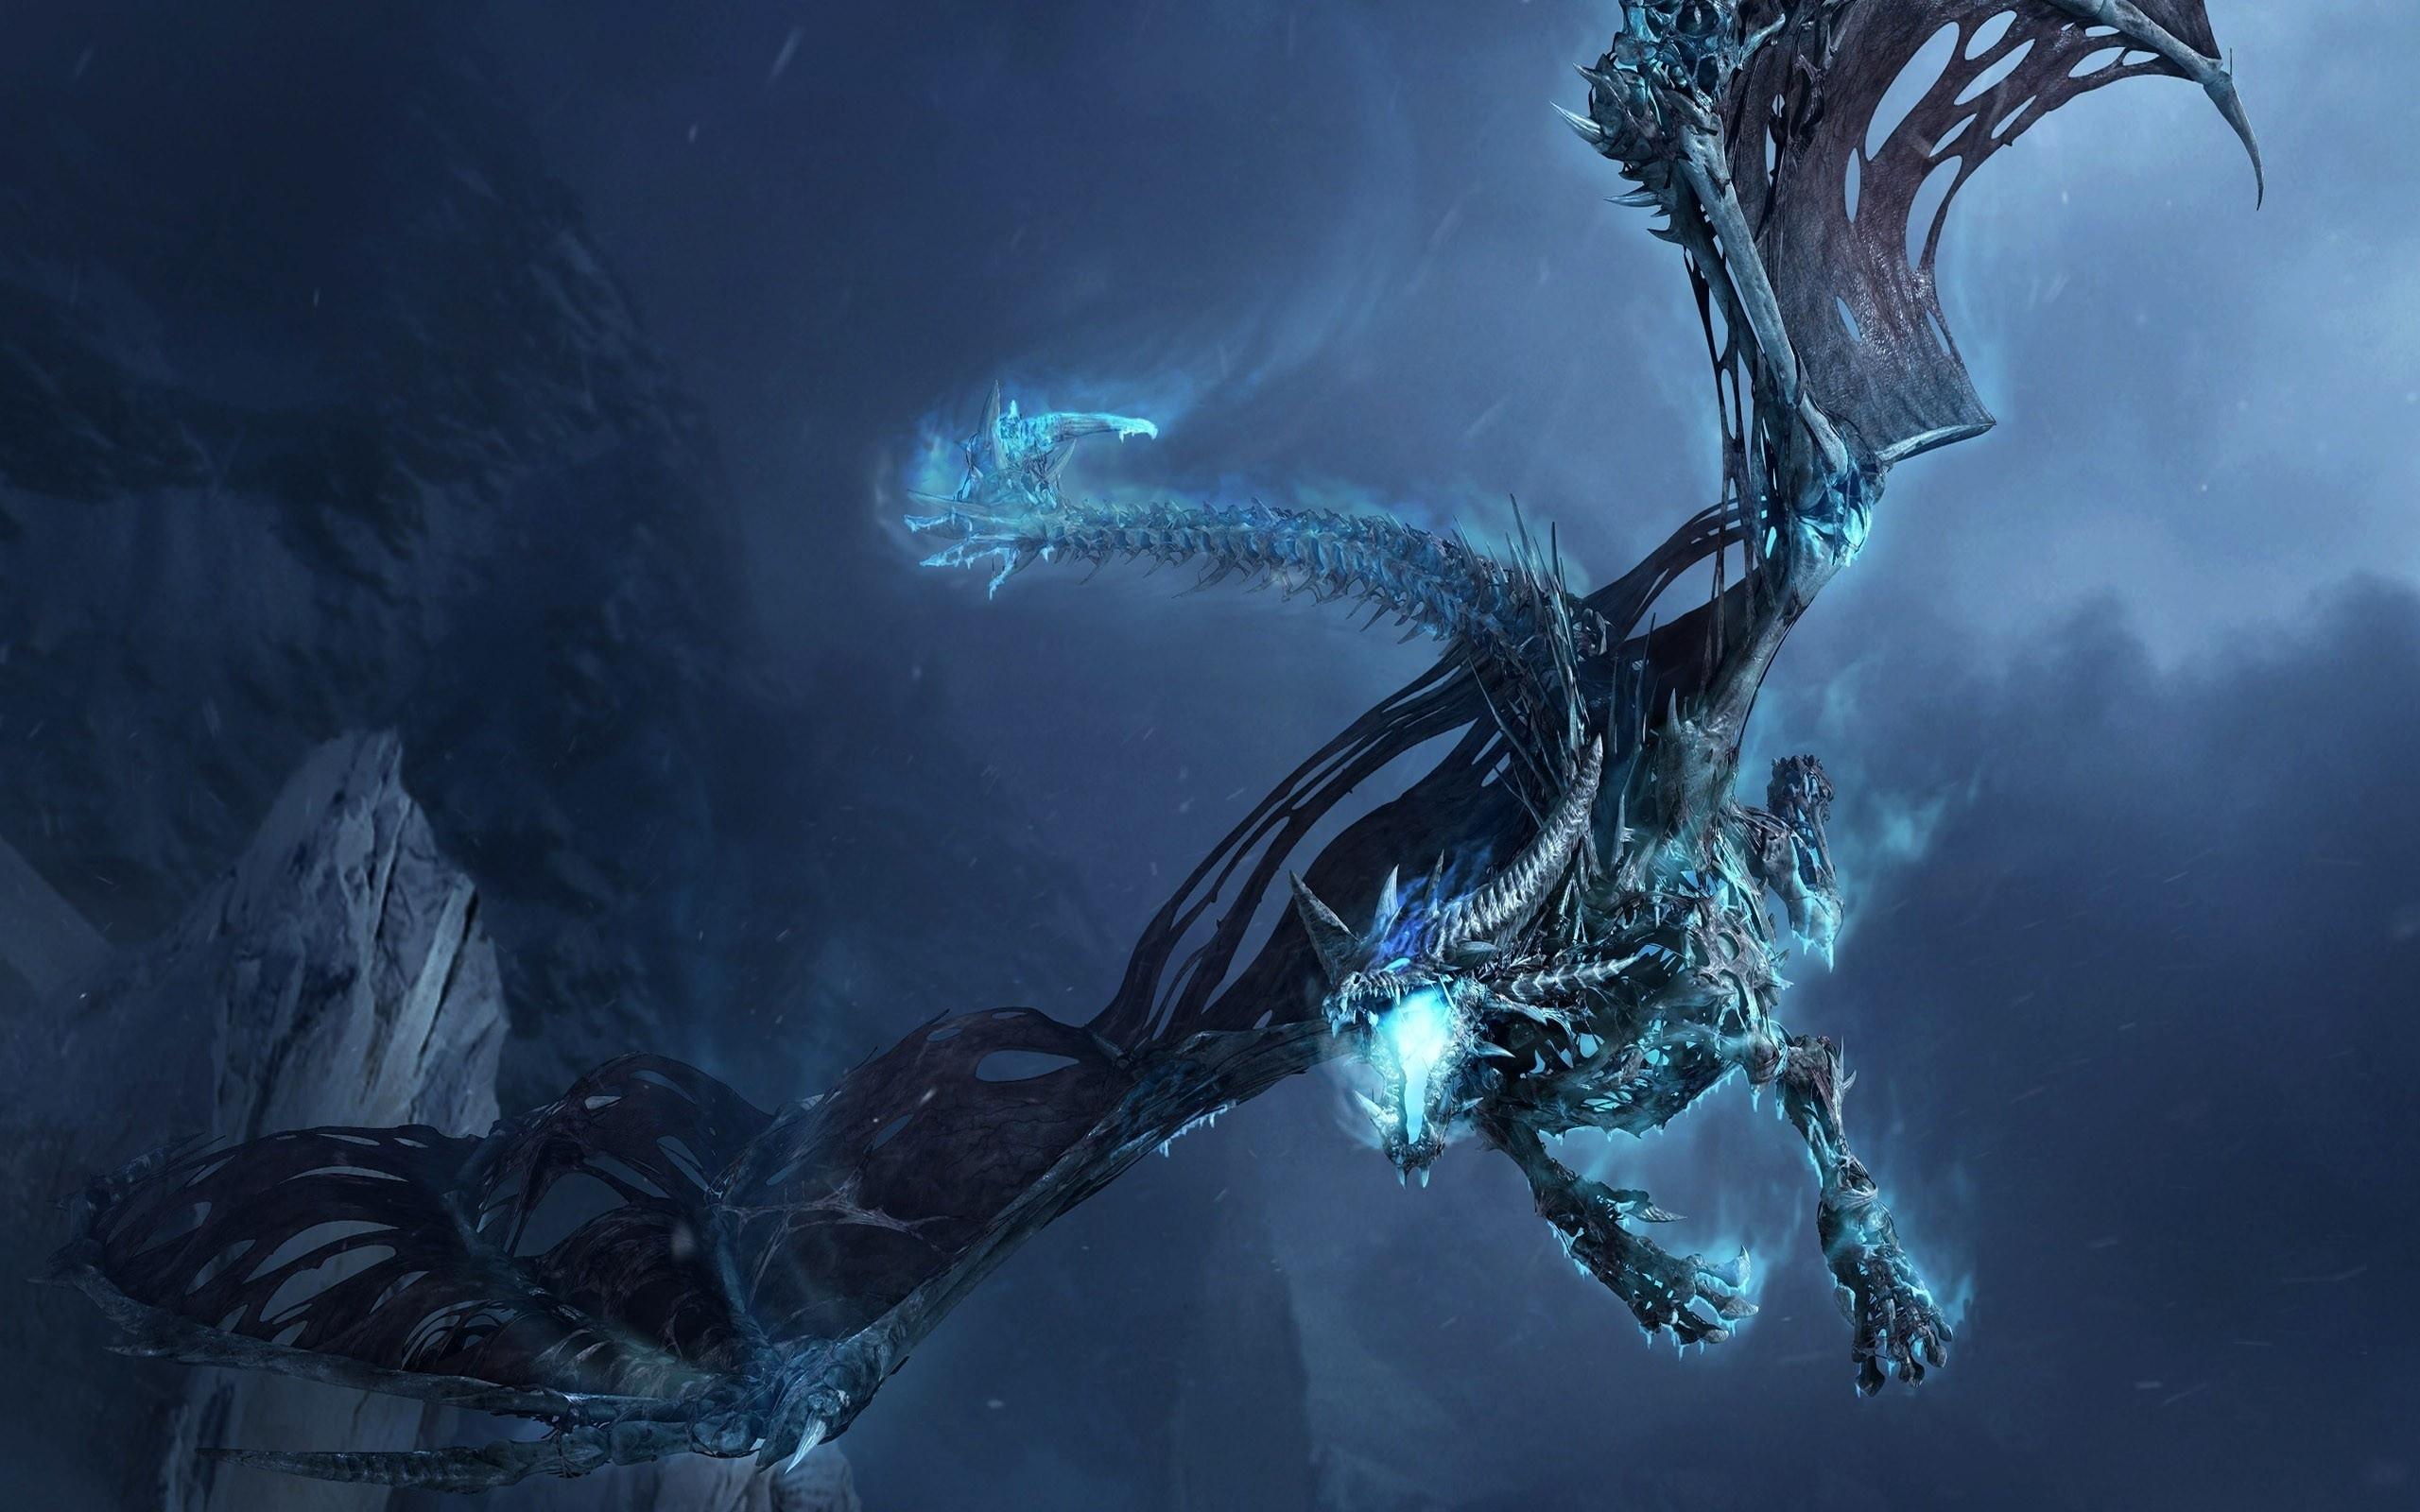 Download Wallpaper Night Dragon - night-dragon-rocks-mythology-Fly-ghost-ship-Jaws-screenshot-computer-wallpaper-fictional-character-636976  Snapshot.jpg